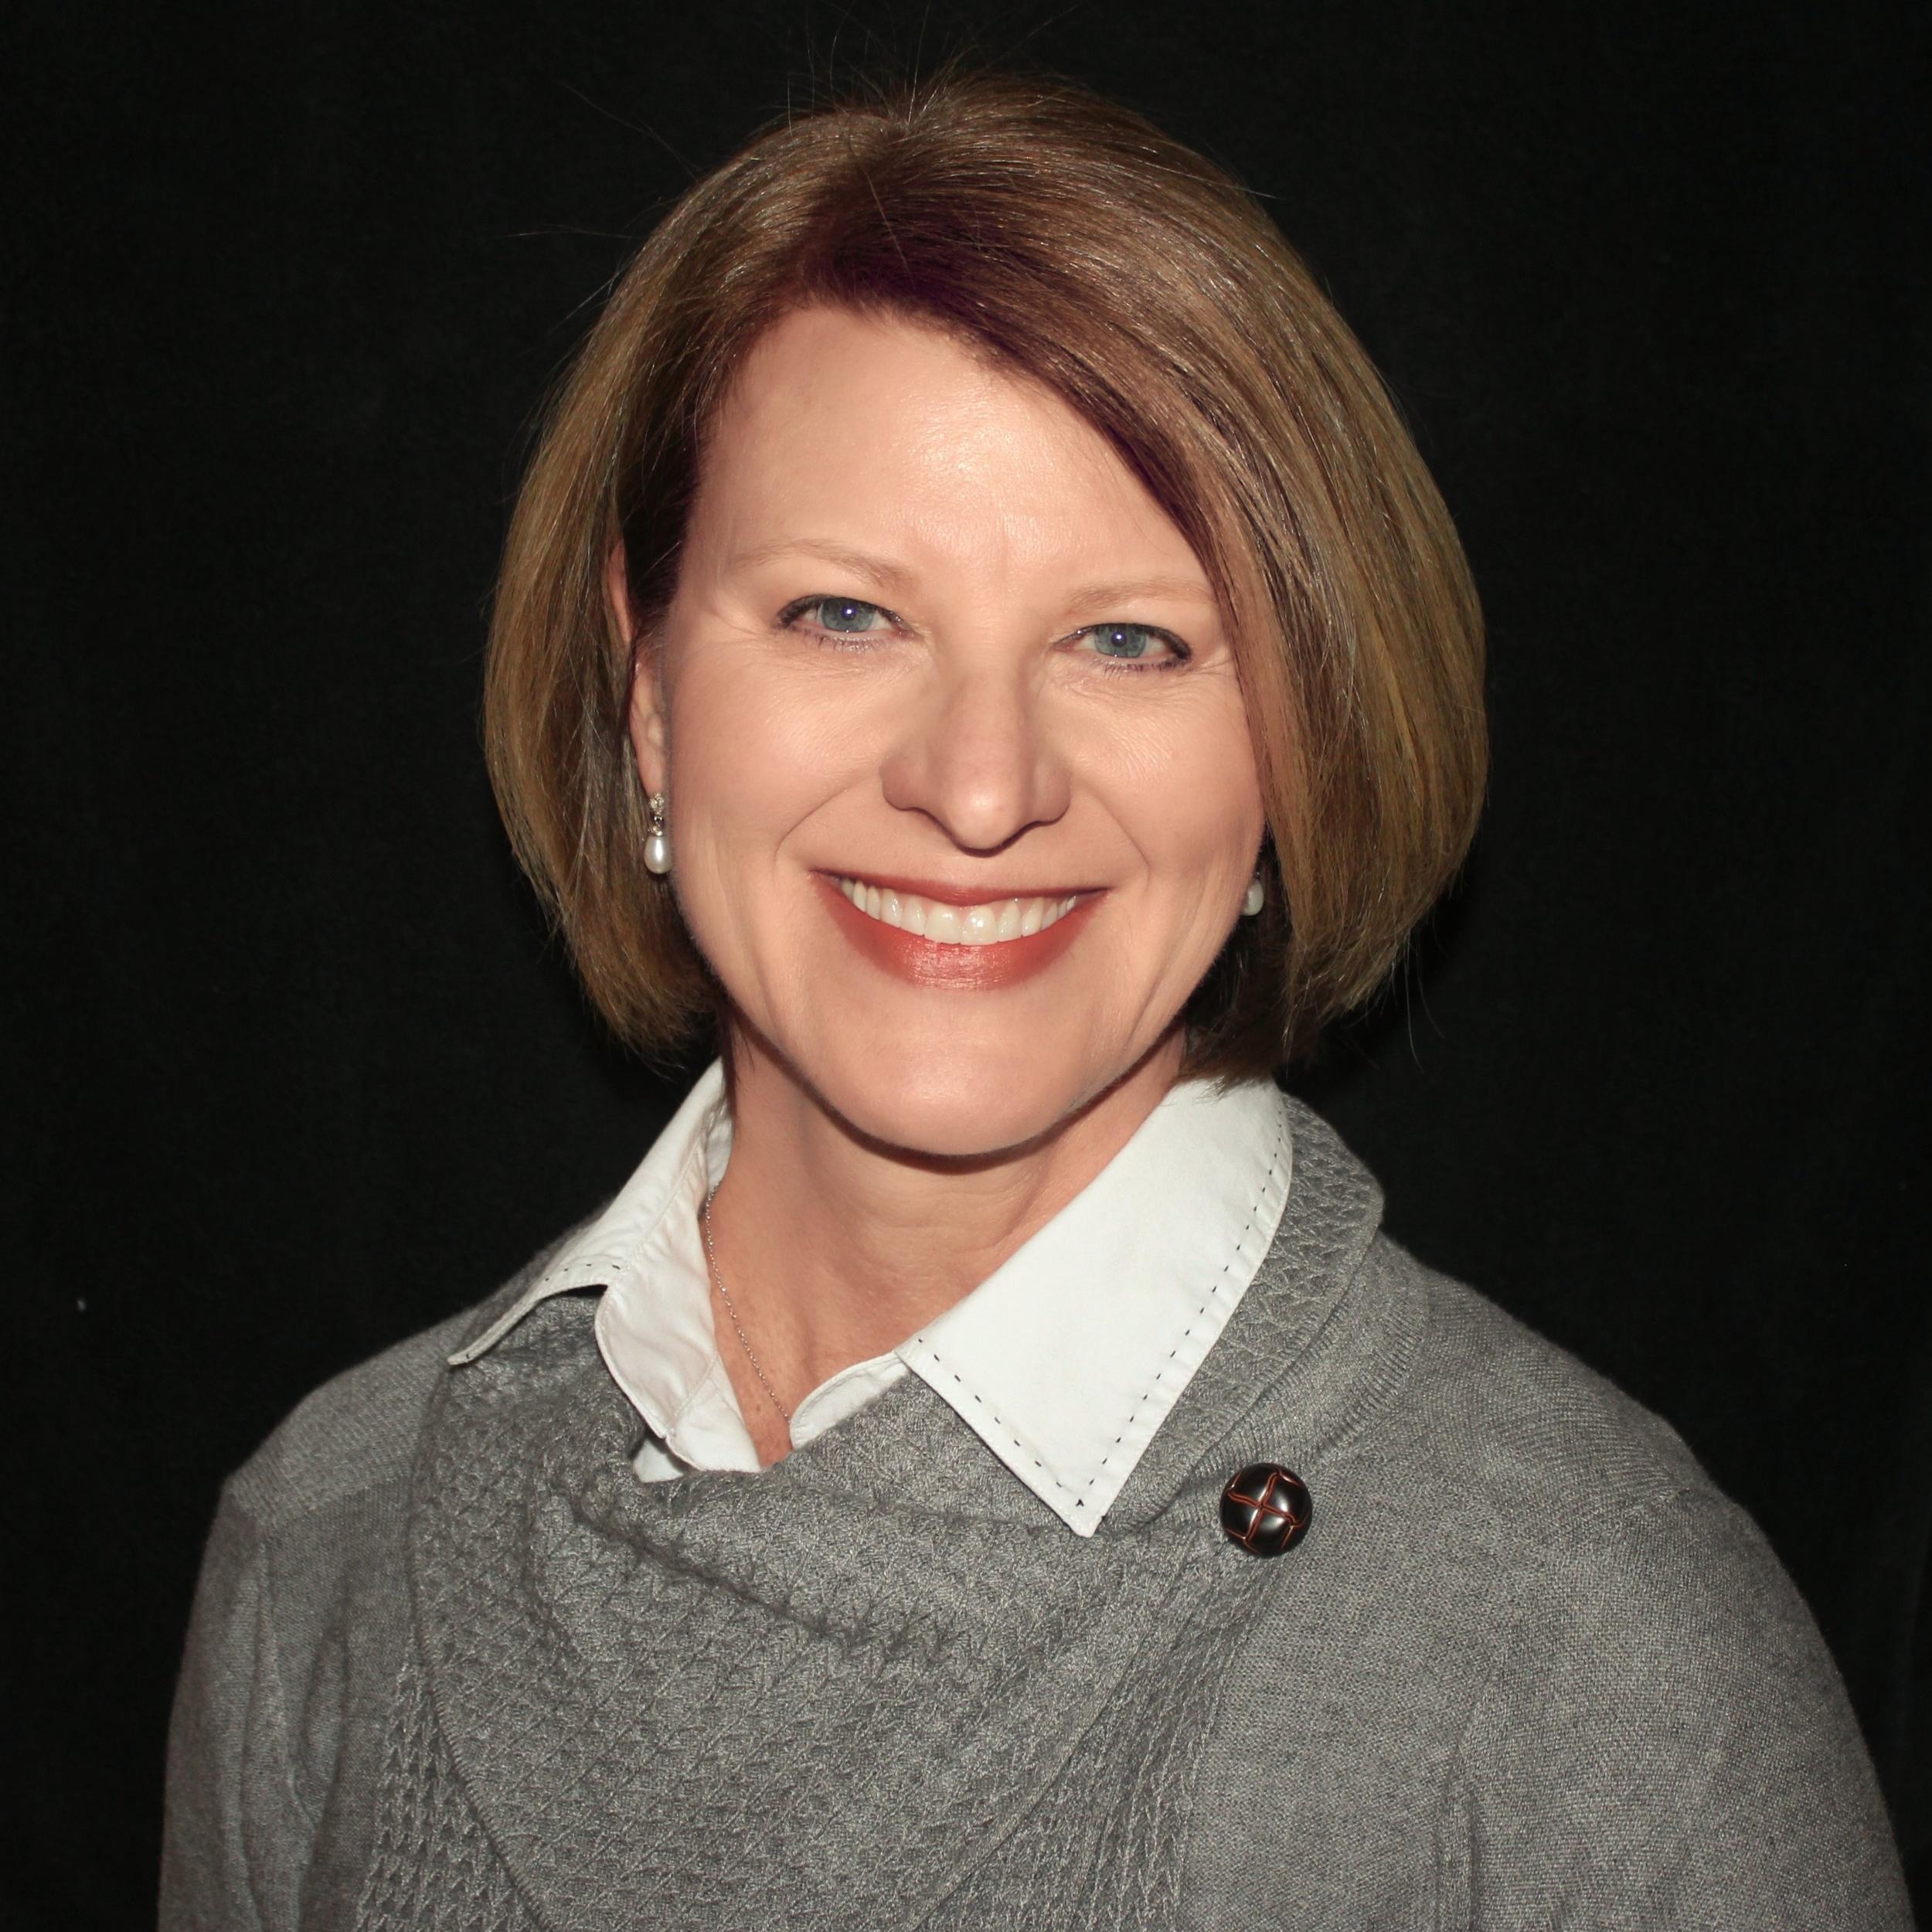 Shelly M. Rowan, Partner - Location: Boulder OfficeP | 303.581.0722E | srowan@promolaw.com